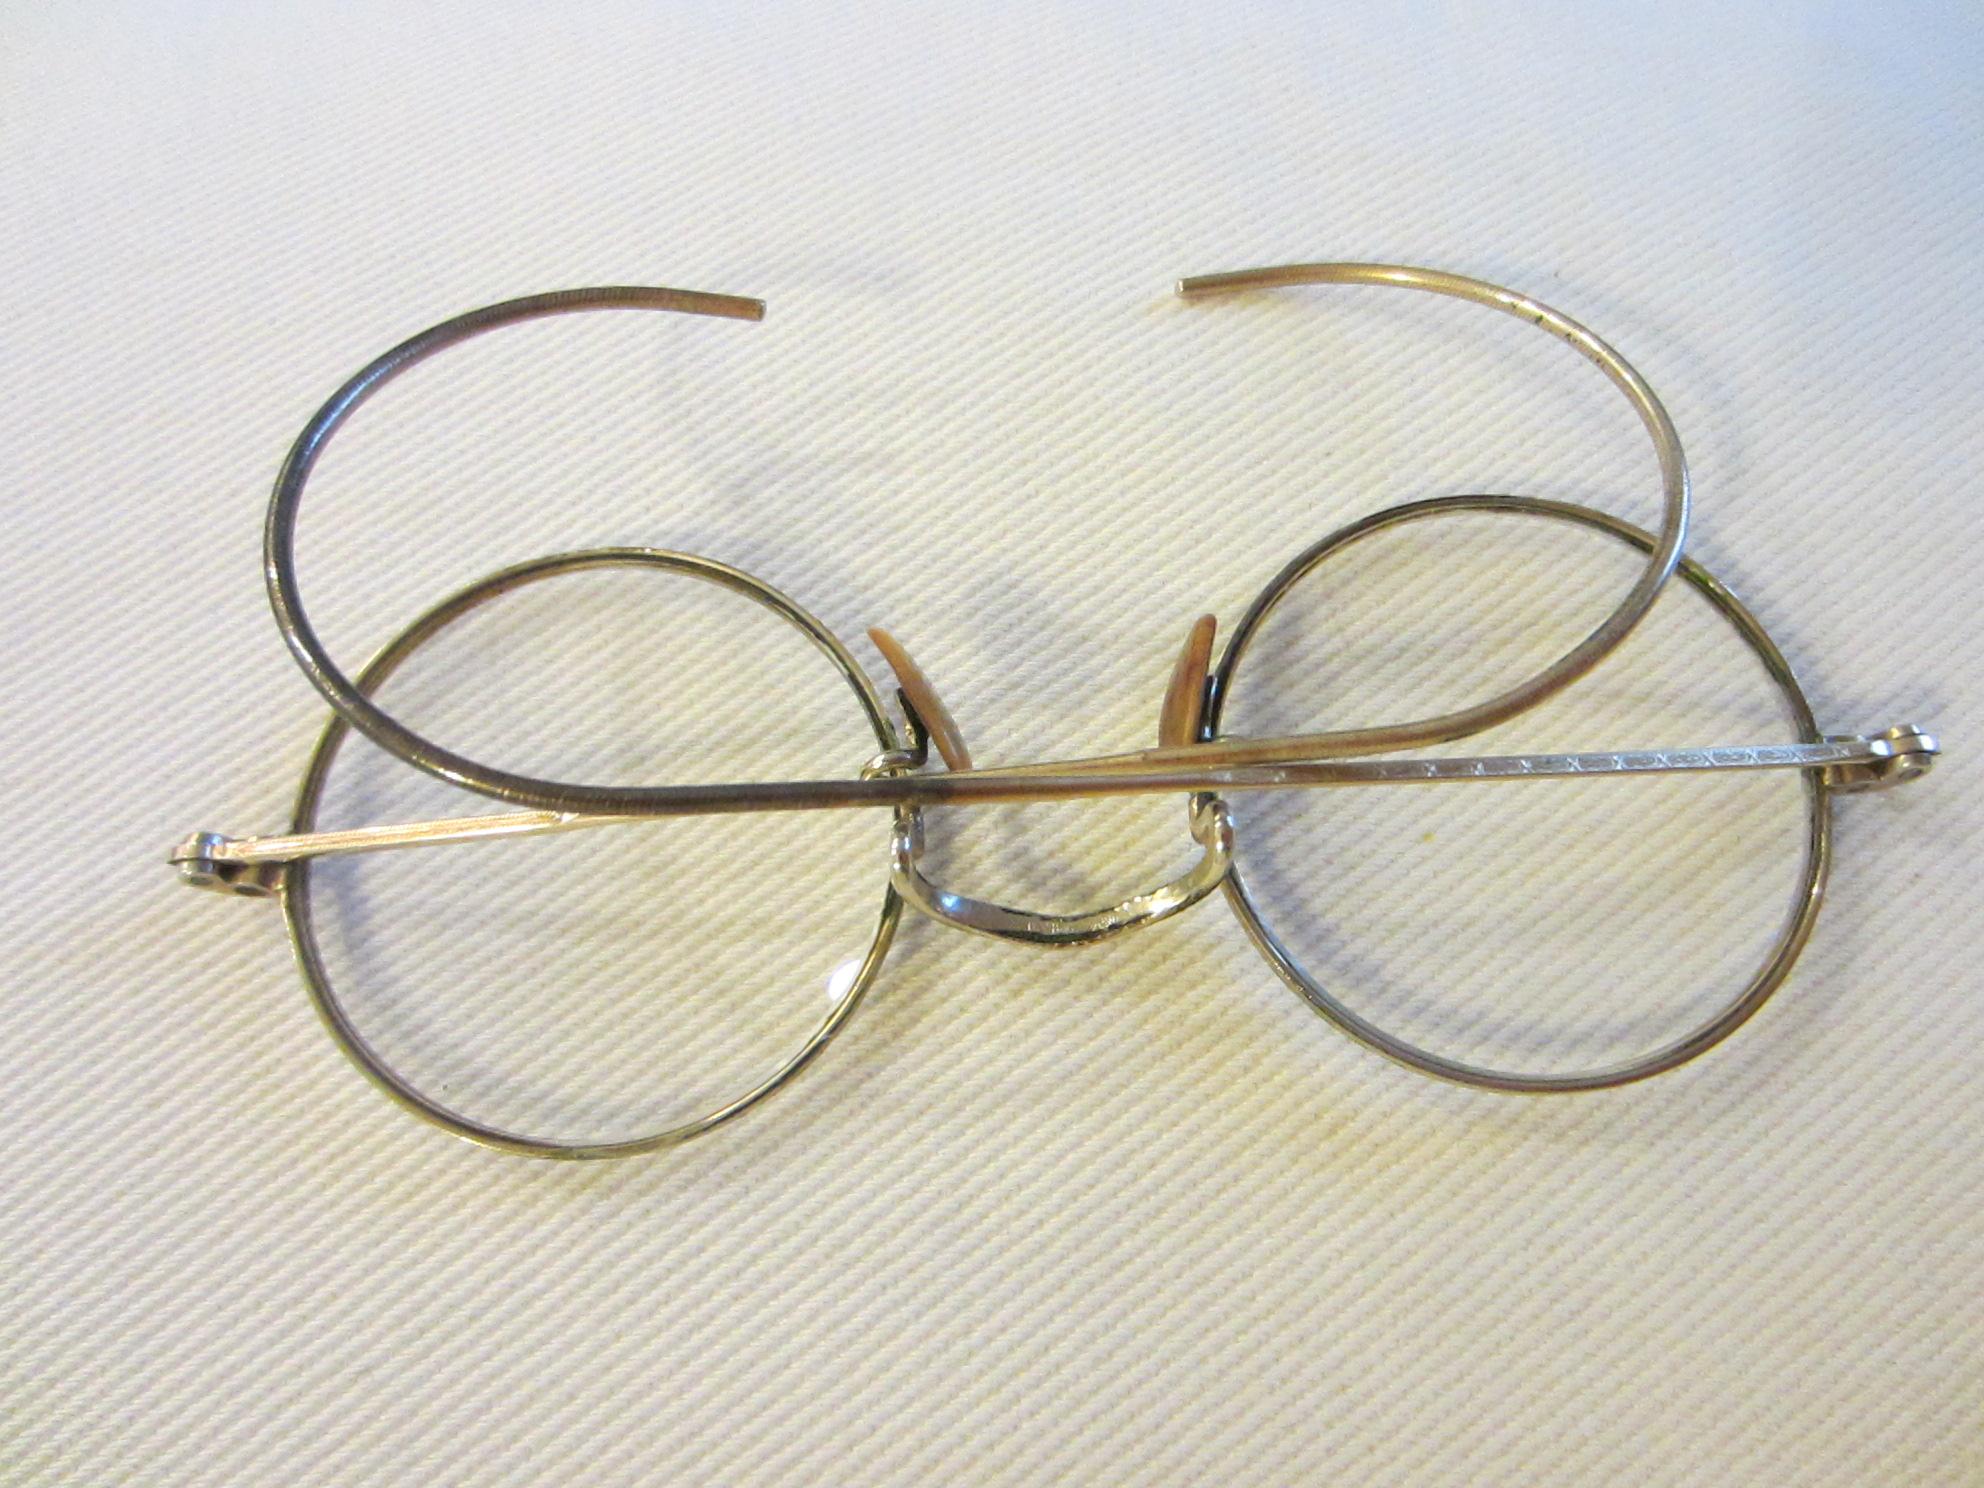 vintage retro eyeglass for sale antiques classifieds